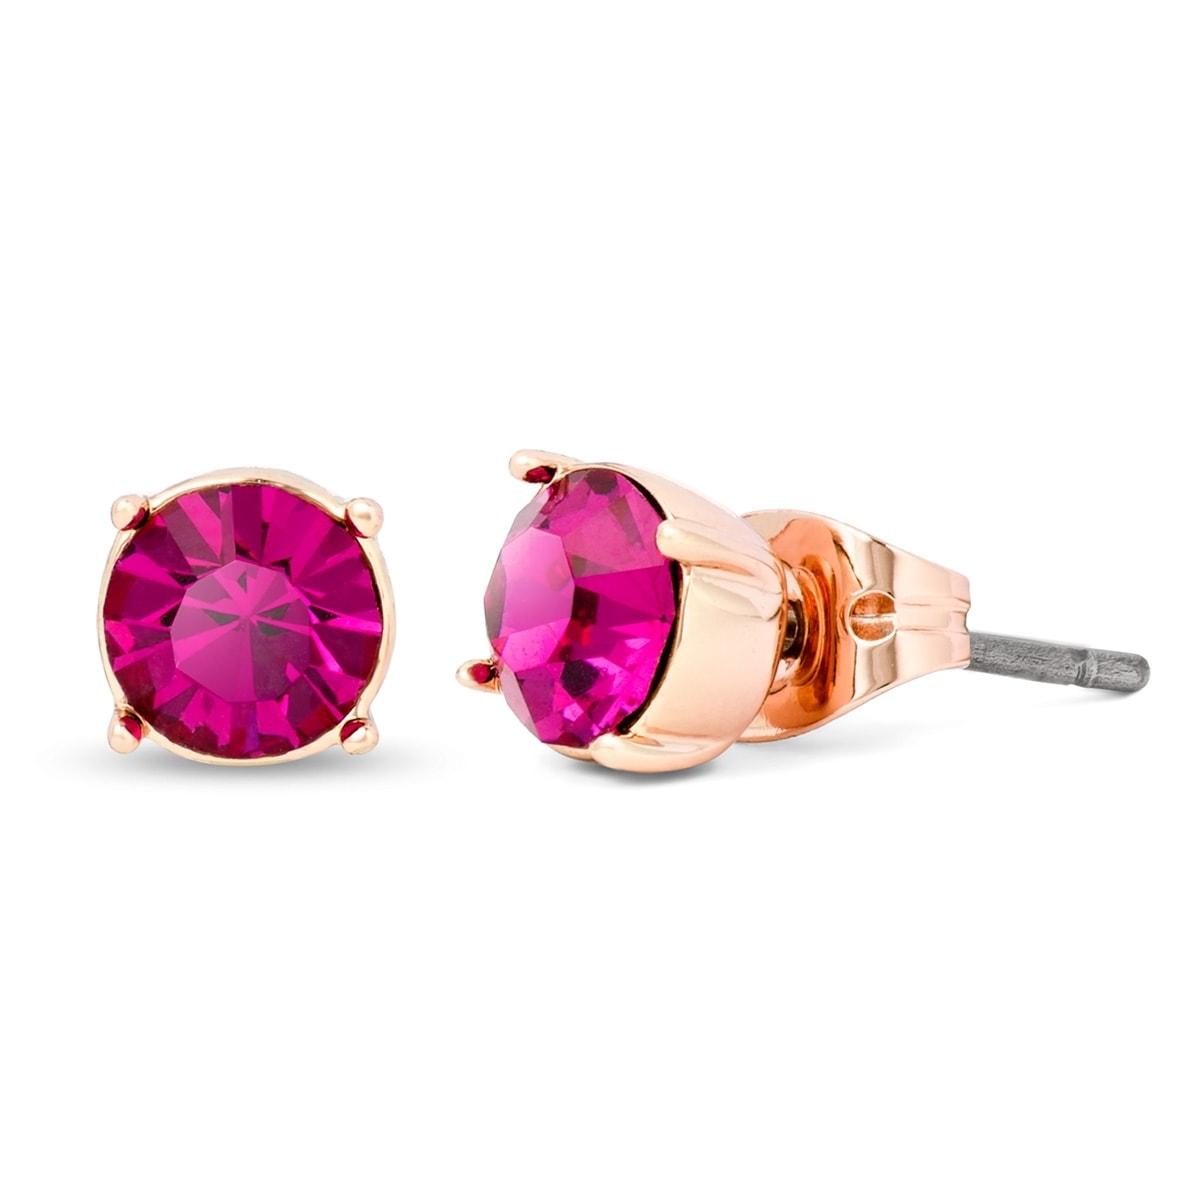 Pippa & Jean Paar Ohrstecker Set: PJ042, (2 tlg.), mit Glaskristallen rosa Damen Ohrringe Schmuck